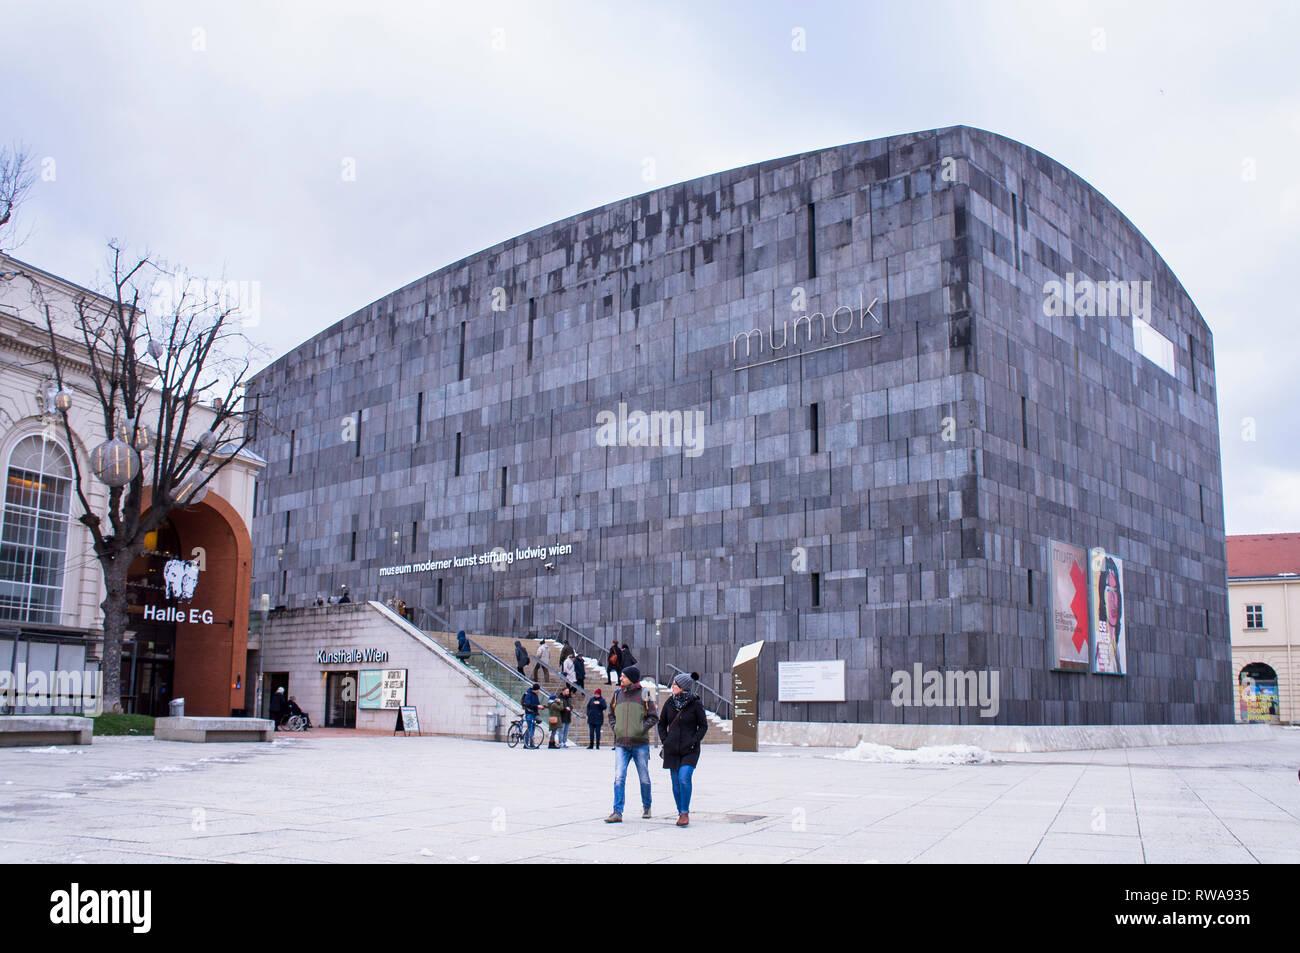 The Museum of Modern Art, Museumsquartier (MQ), Museumsplatz, Mumok, Museum moderner Kunst Stiftung Ludwig Wien in Vienna, Austria, on January 6, 2019 - Stock Image